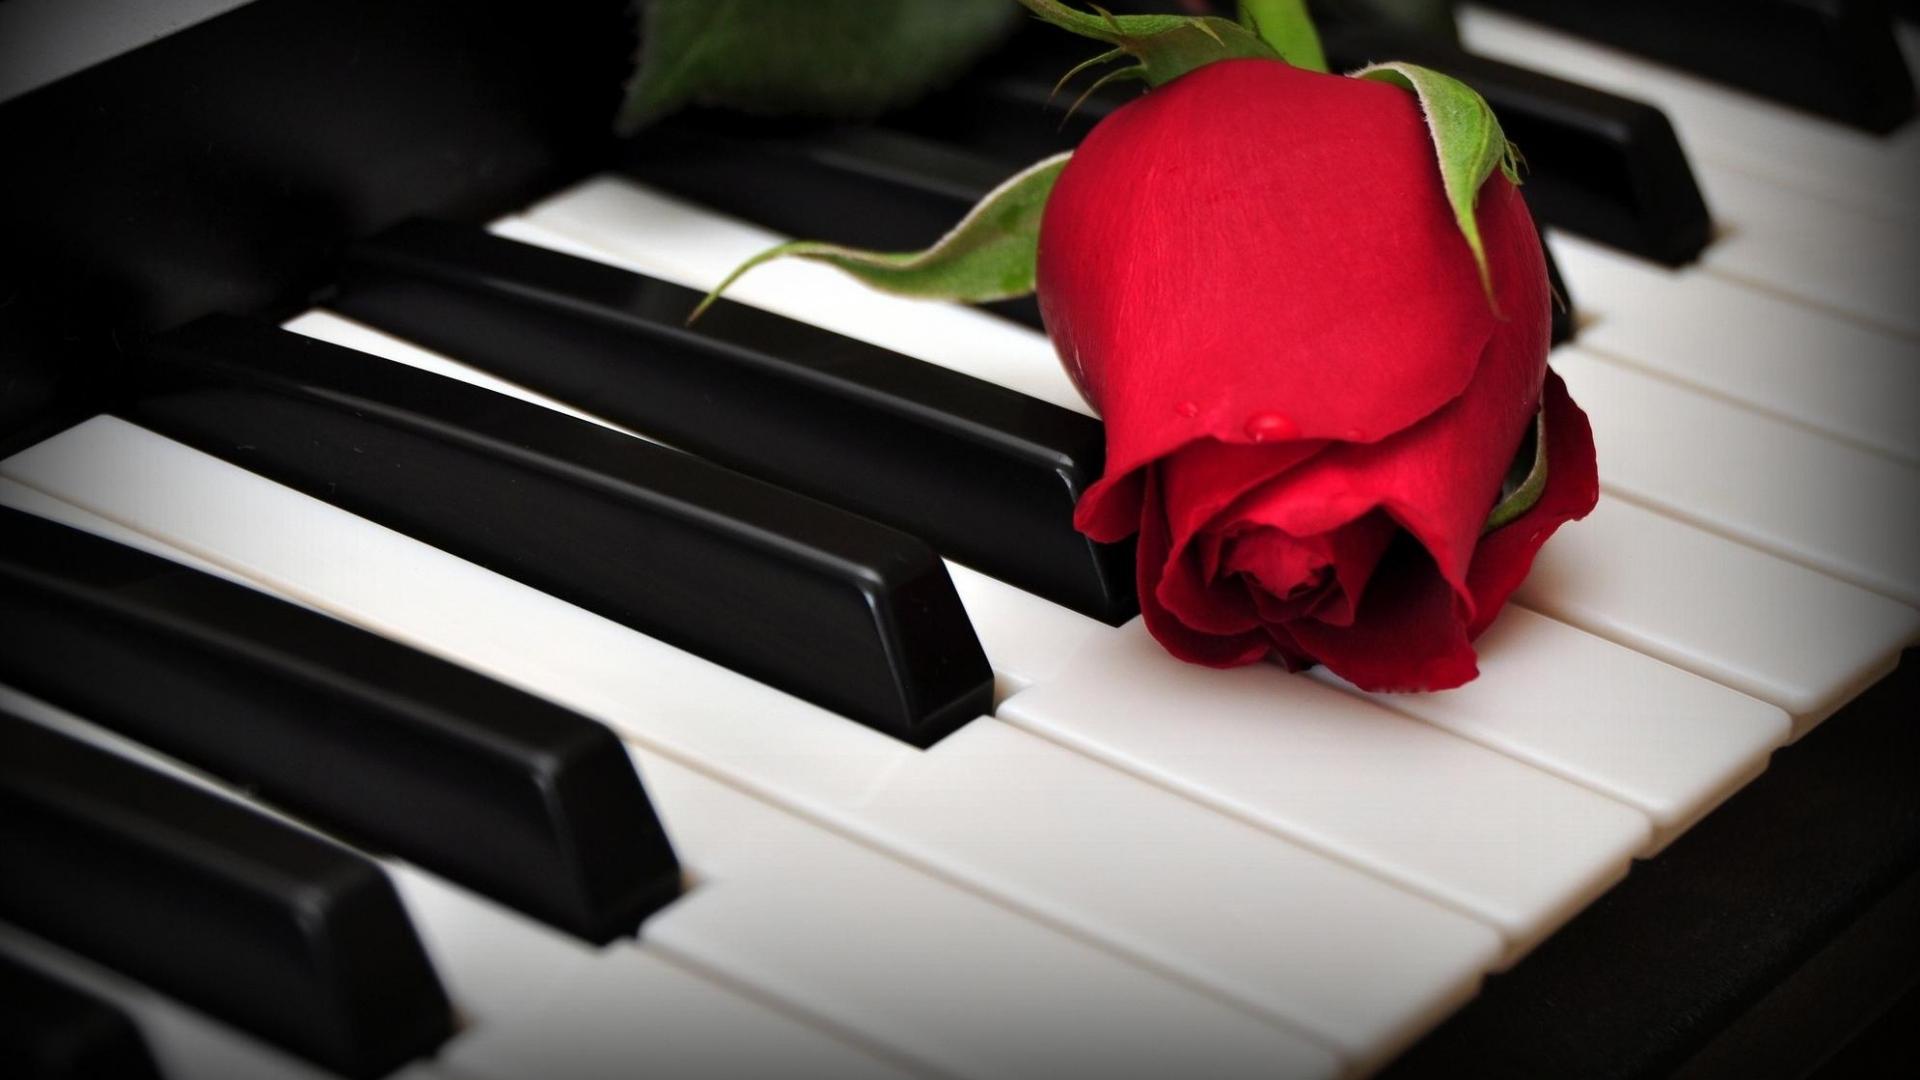 rose_flower_keys_piano_68785_1920x1080